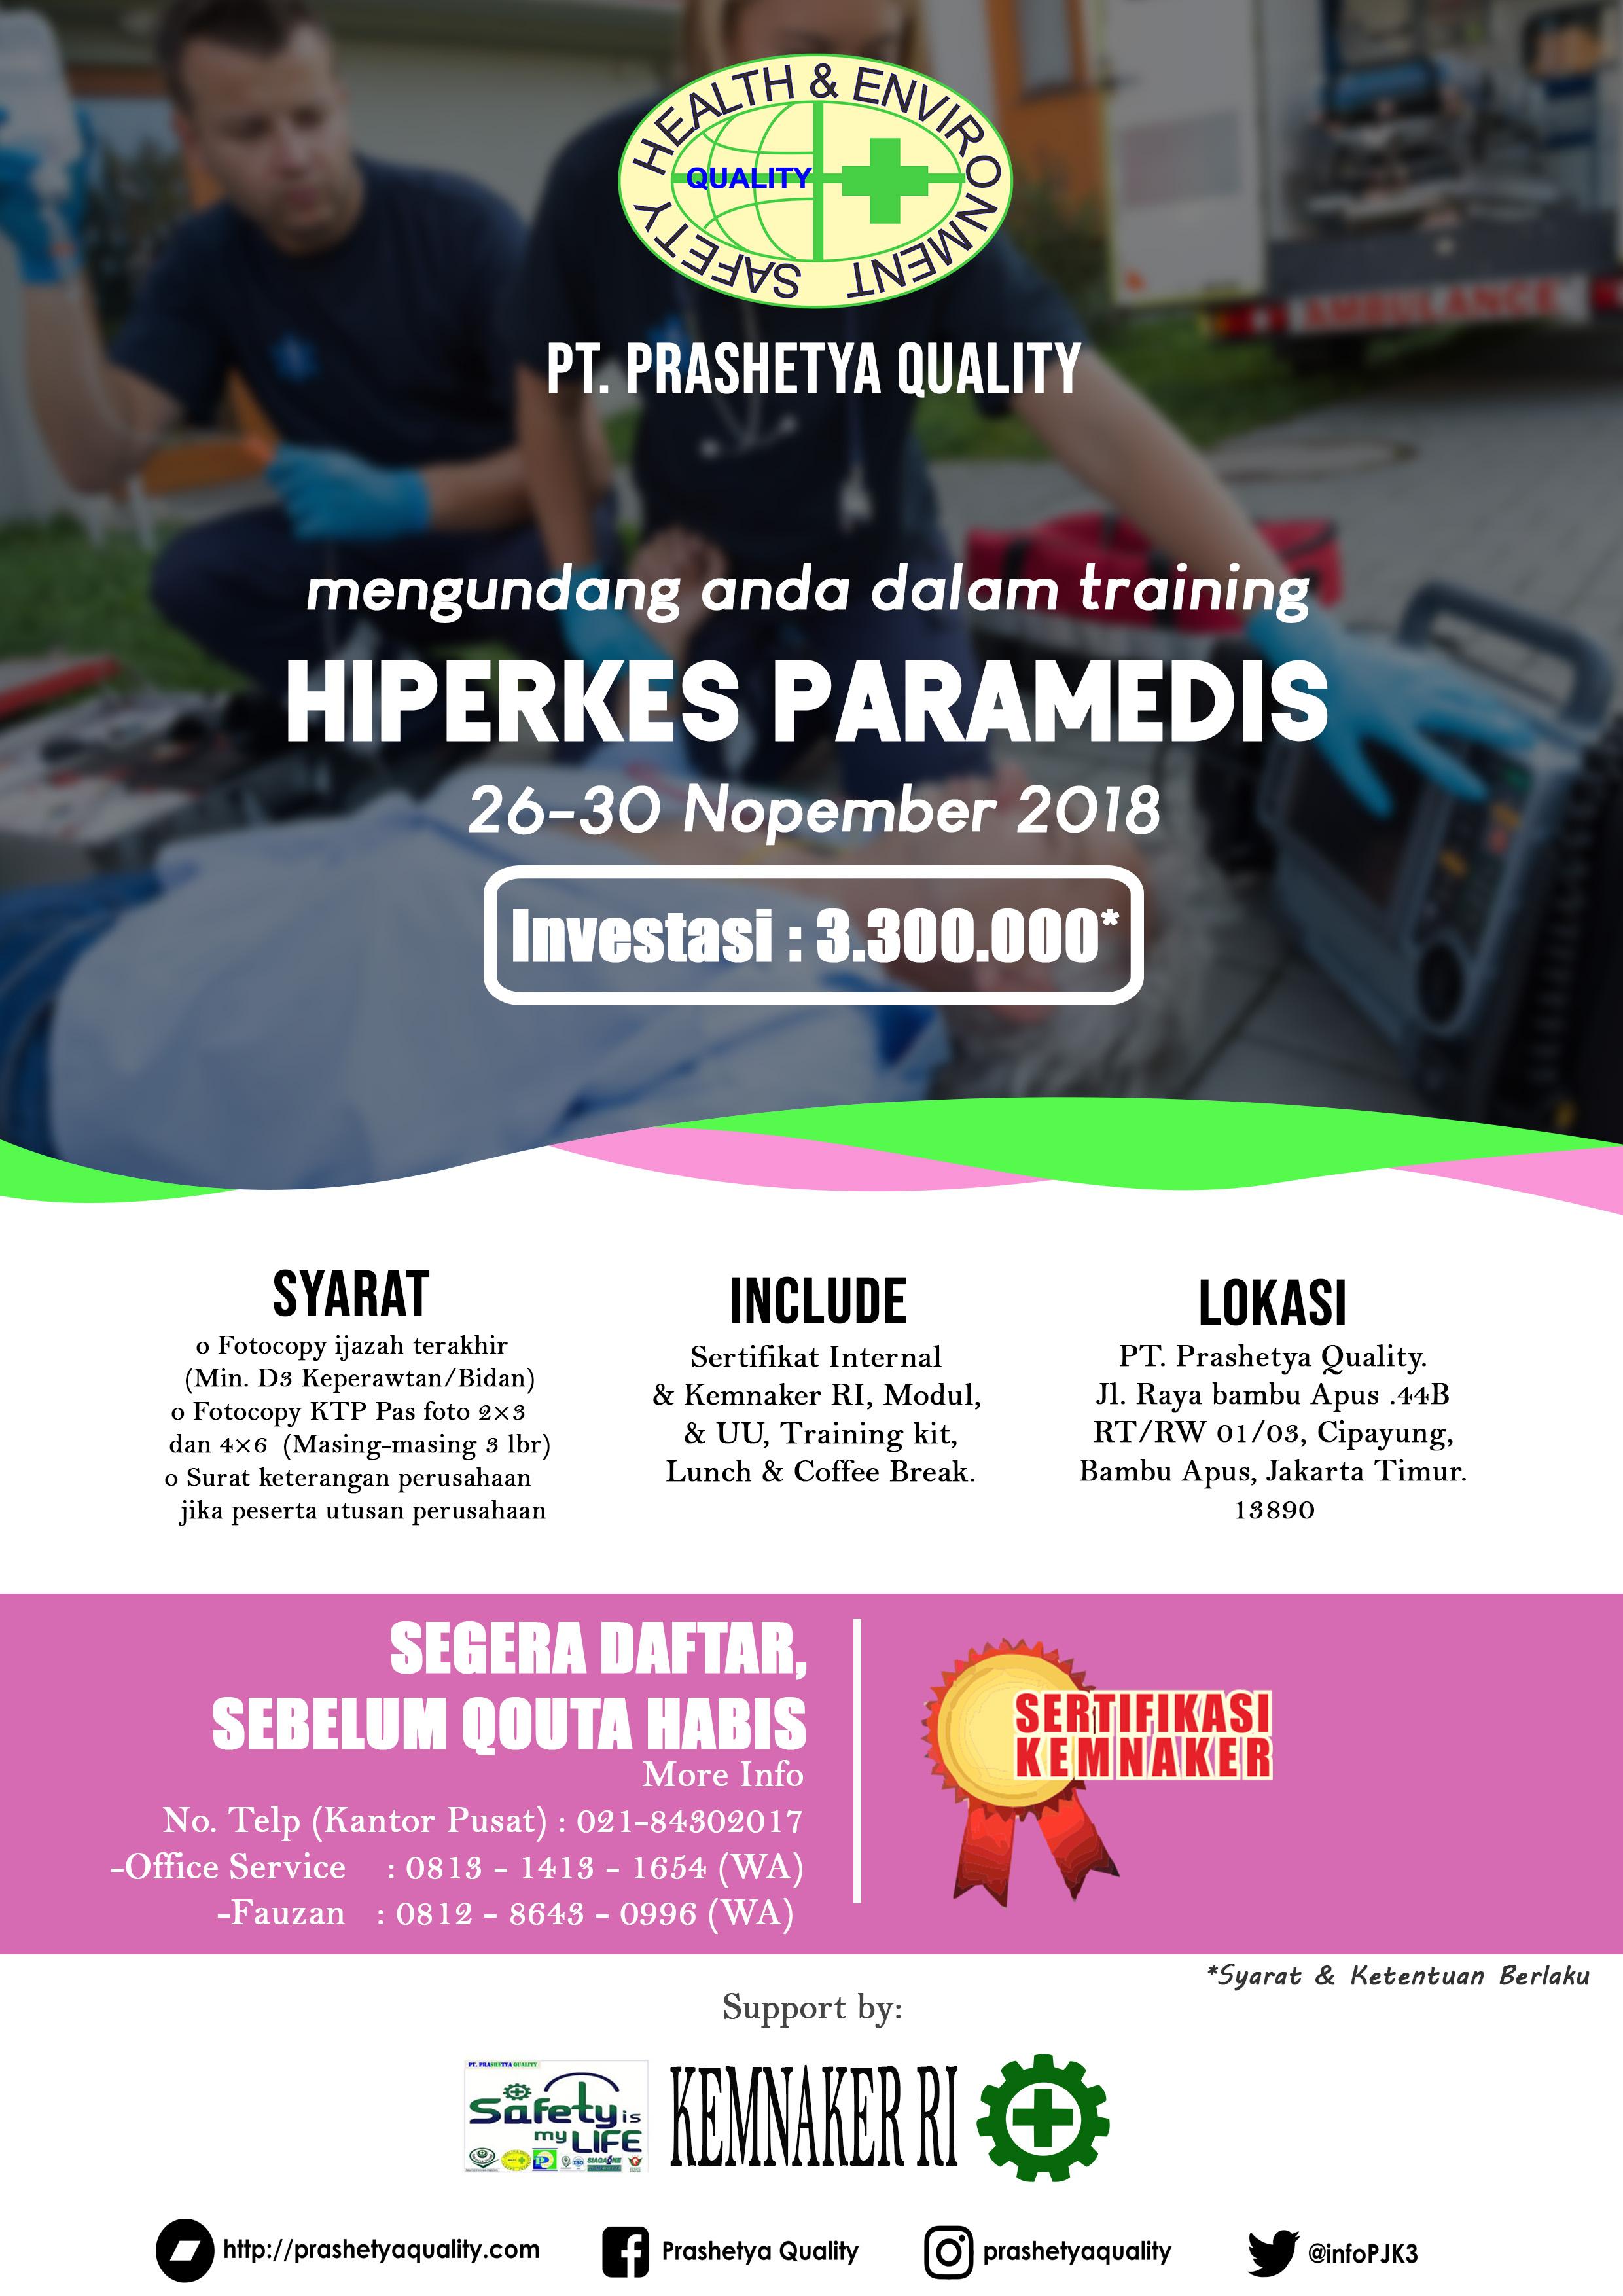 Hiperkes Paramedis